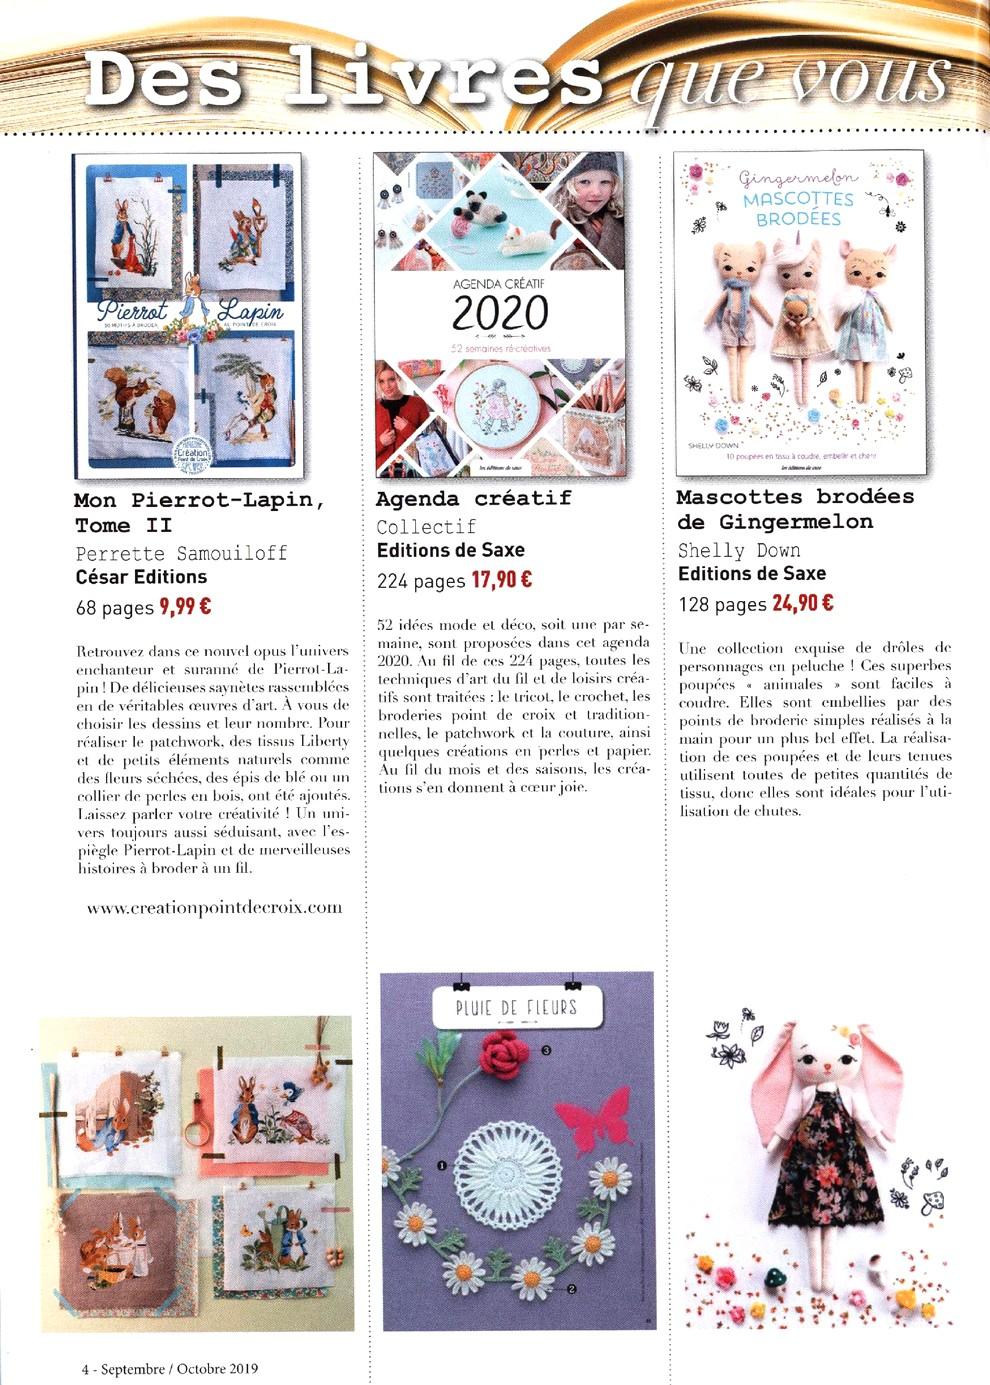 Журнал со схемами вышивки - Creation Point De Croix №78 2019 (4)